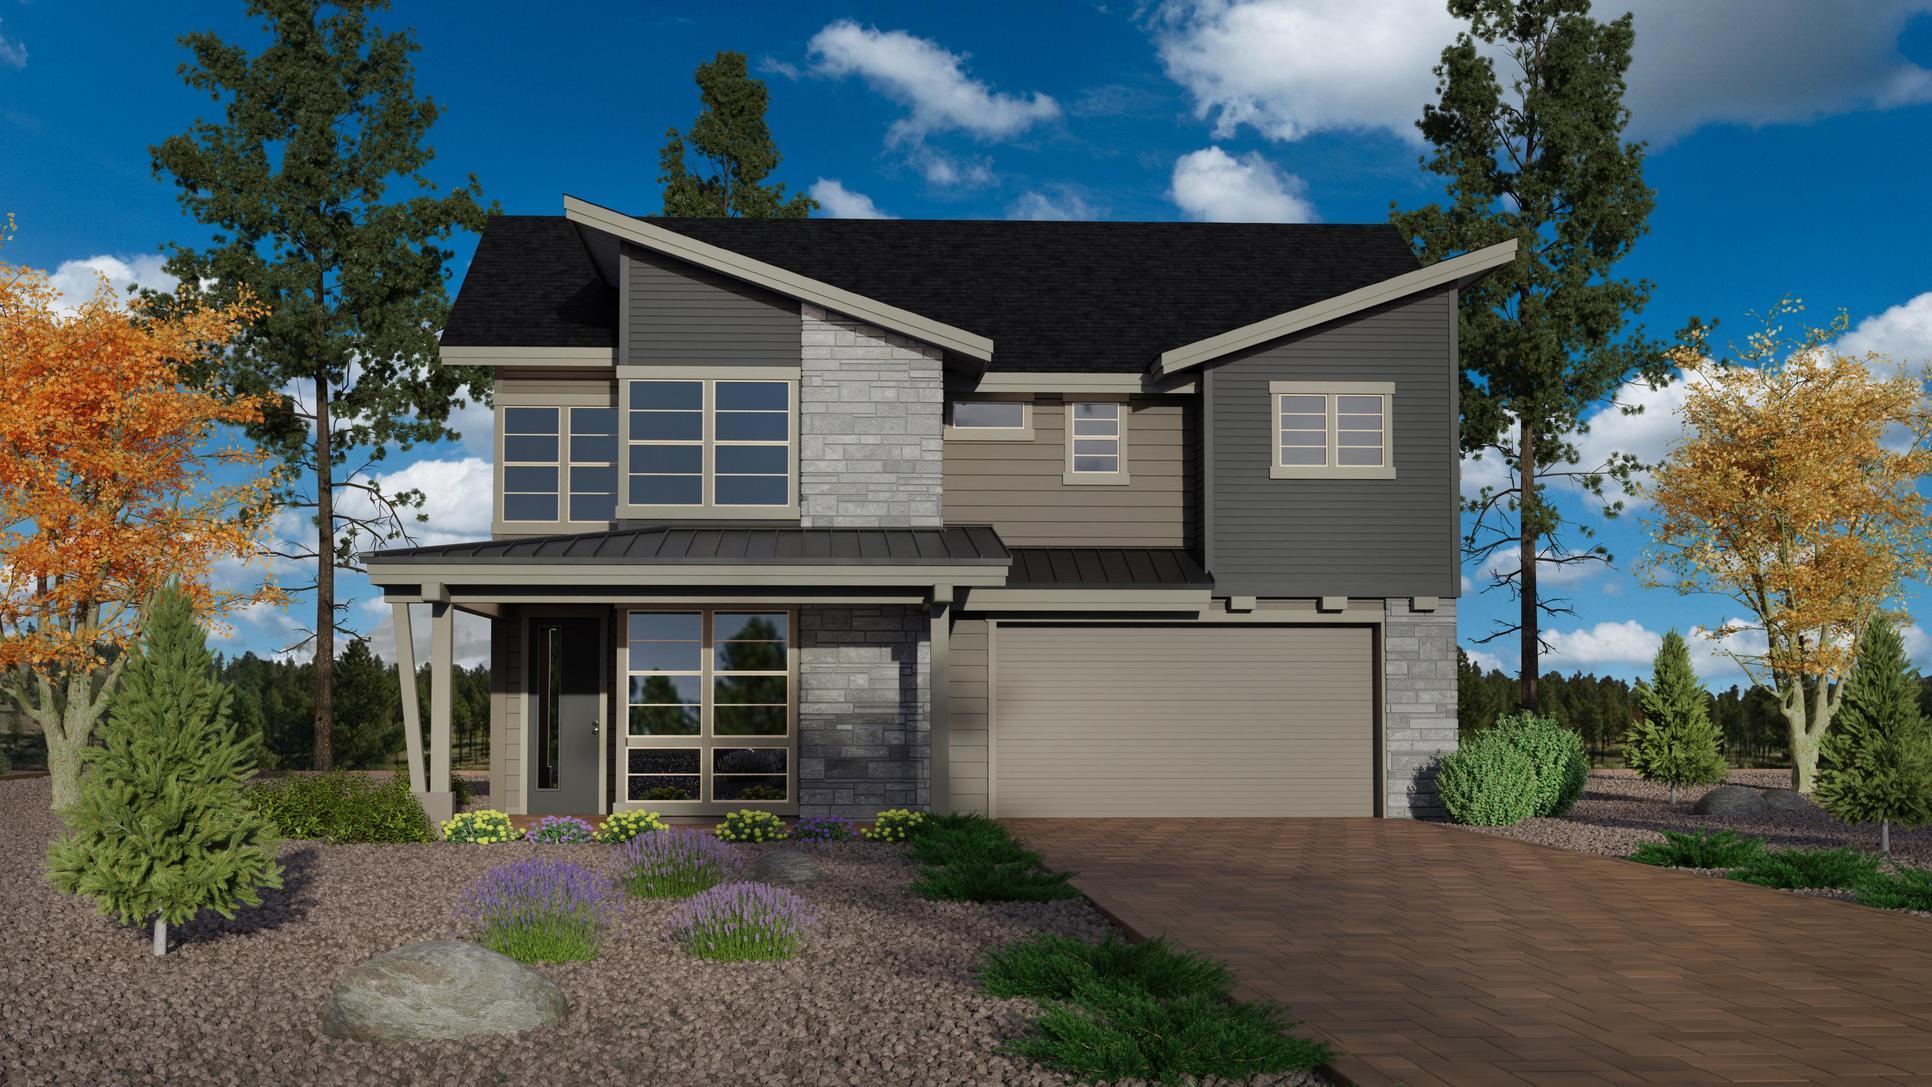 Timber Sky Plan 2443 Elevation C:Timber Sky Plan 2443 Elevation C